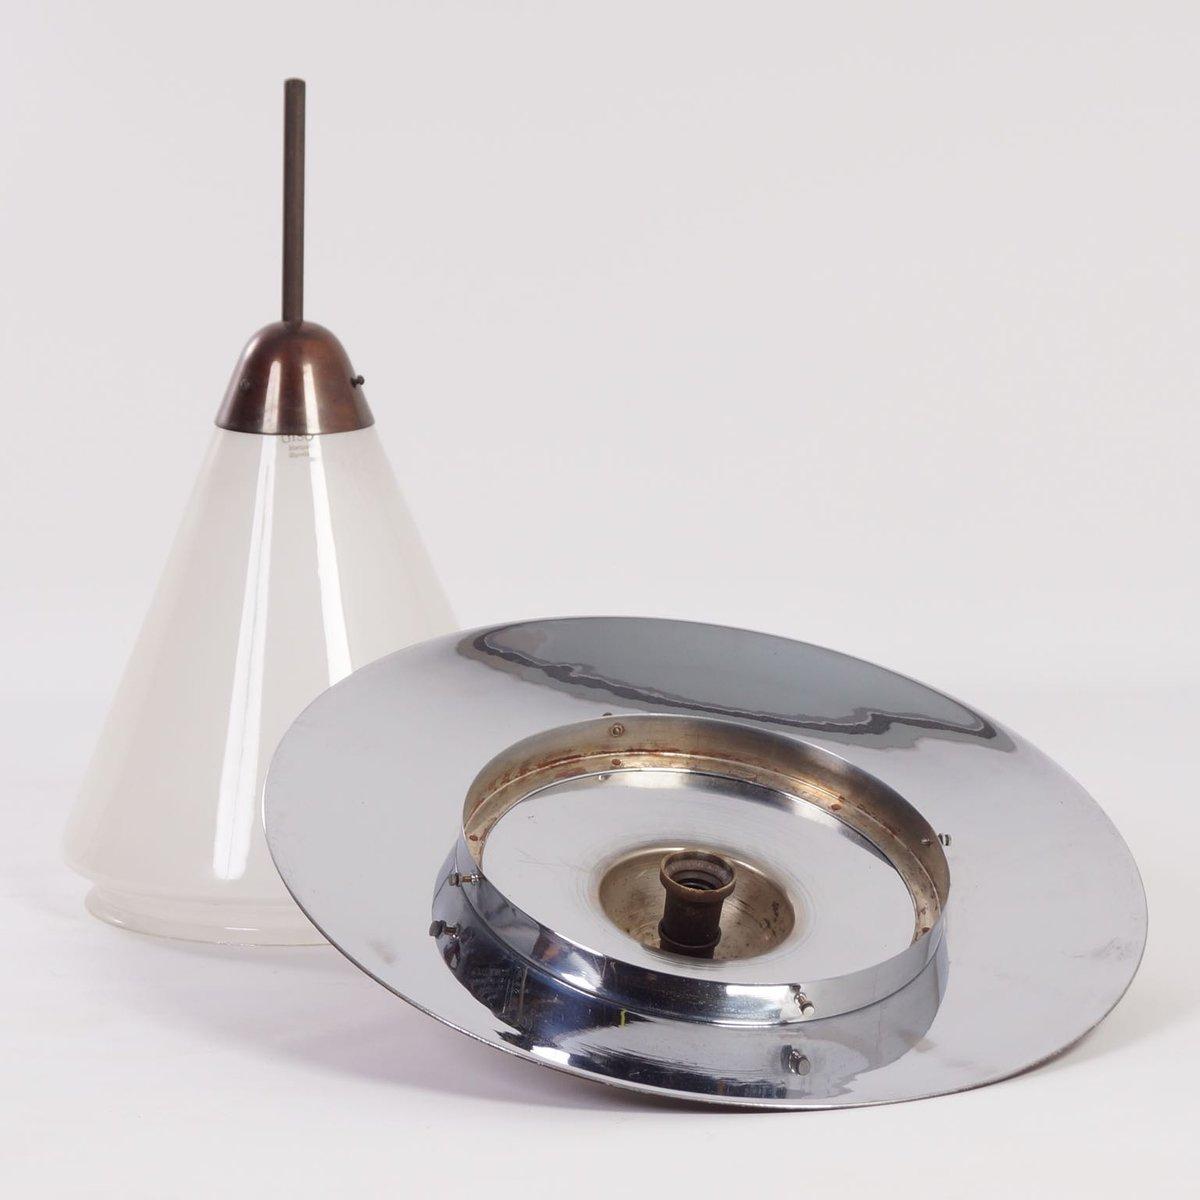 Pendant Light Sale: Giso Pendant Light By W.H Gispen, 1934 For Sale At Pamono